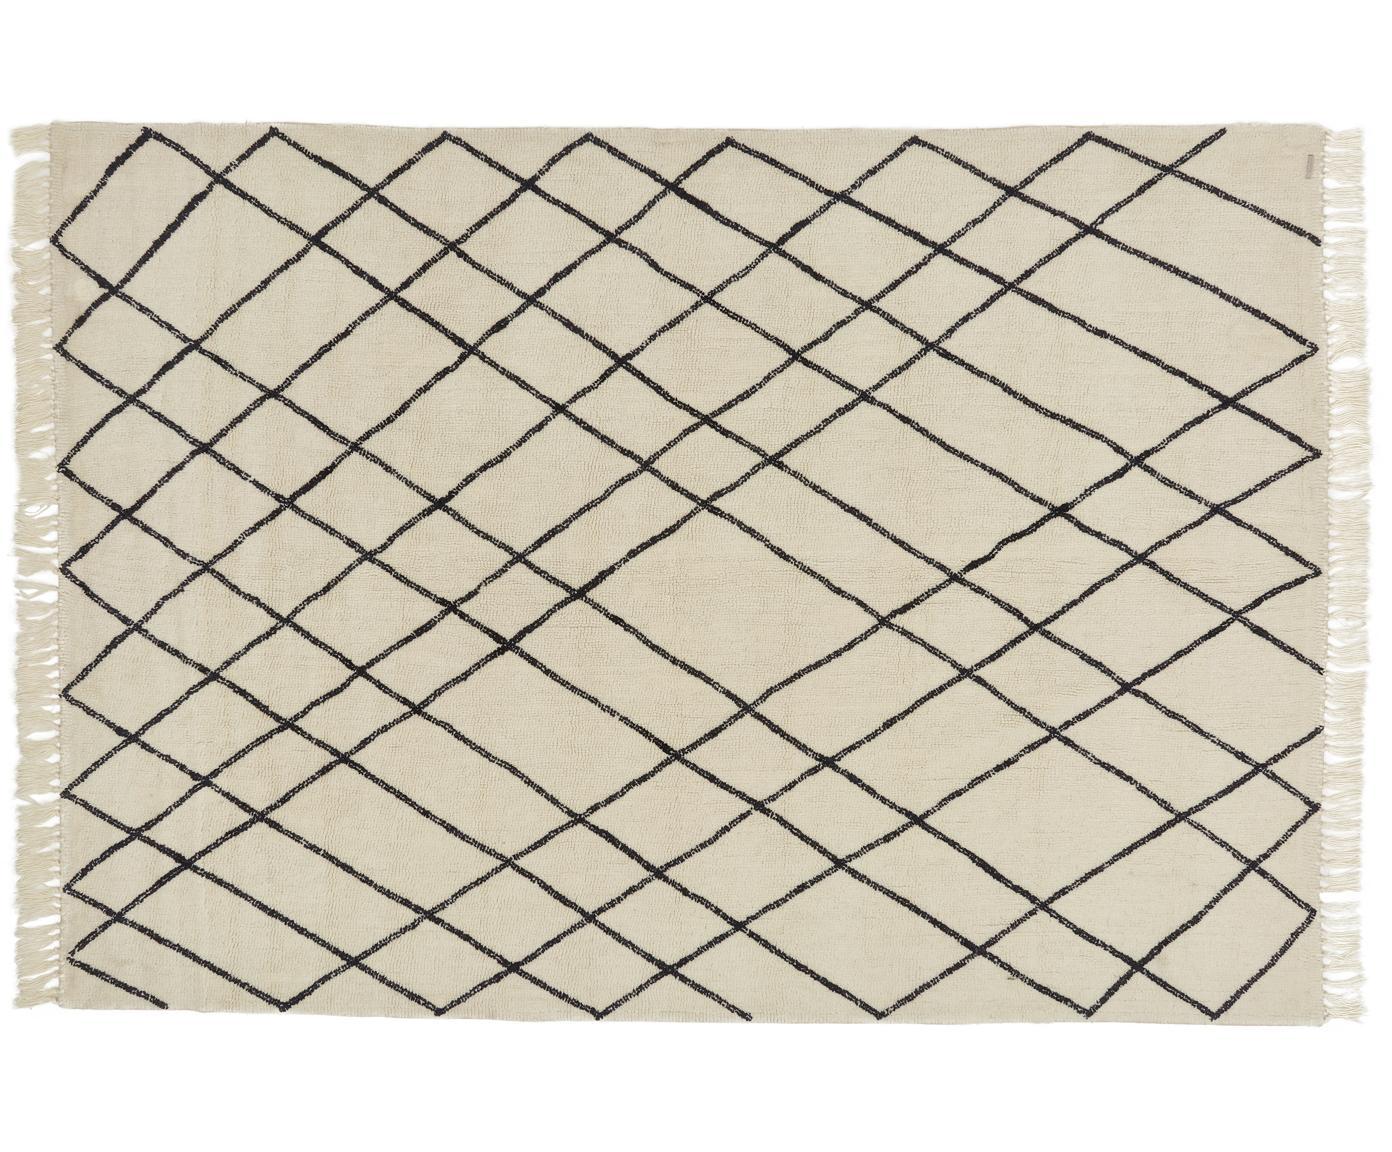 Wollen vloerkleed Graphic Nature, Crèmekleurig, zwarte onregelmatige decoratie, 200 x 300 cm